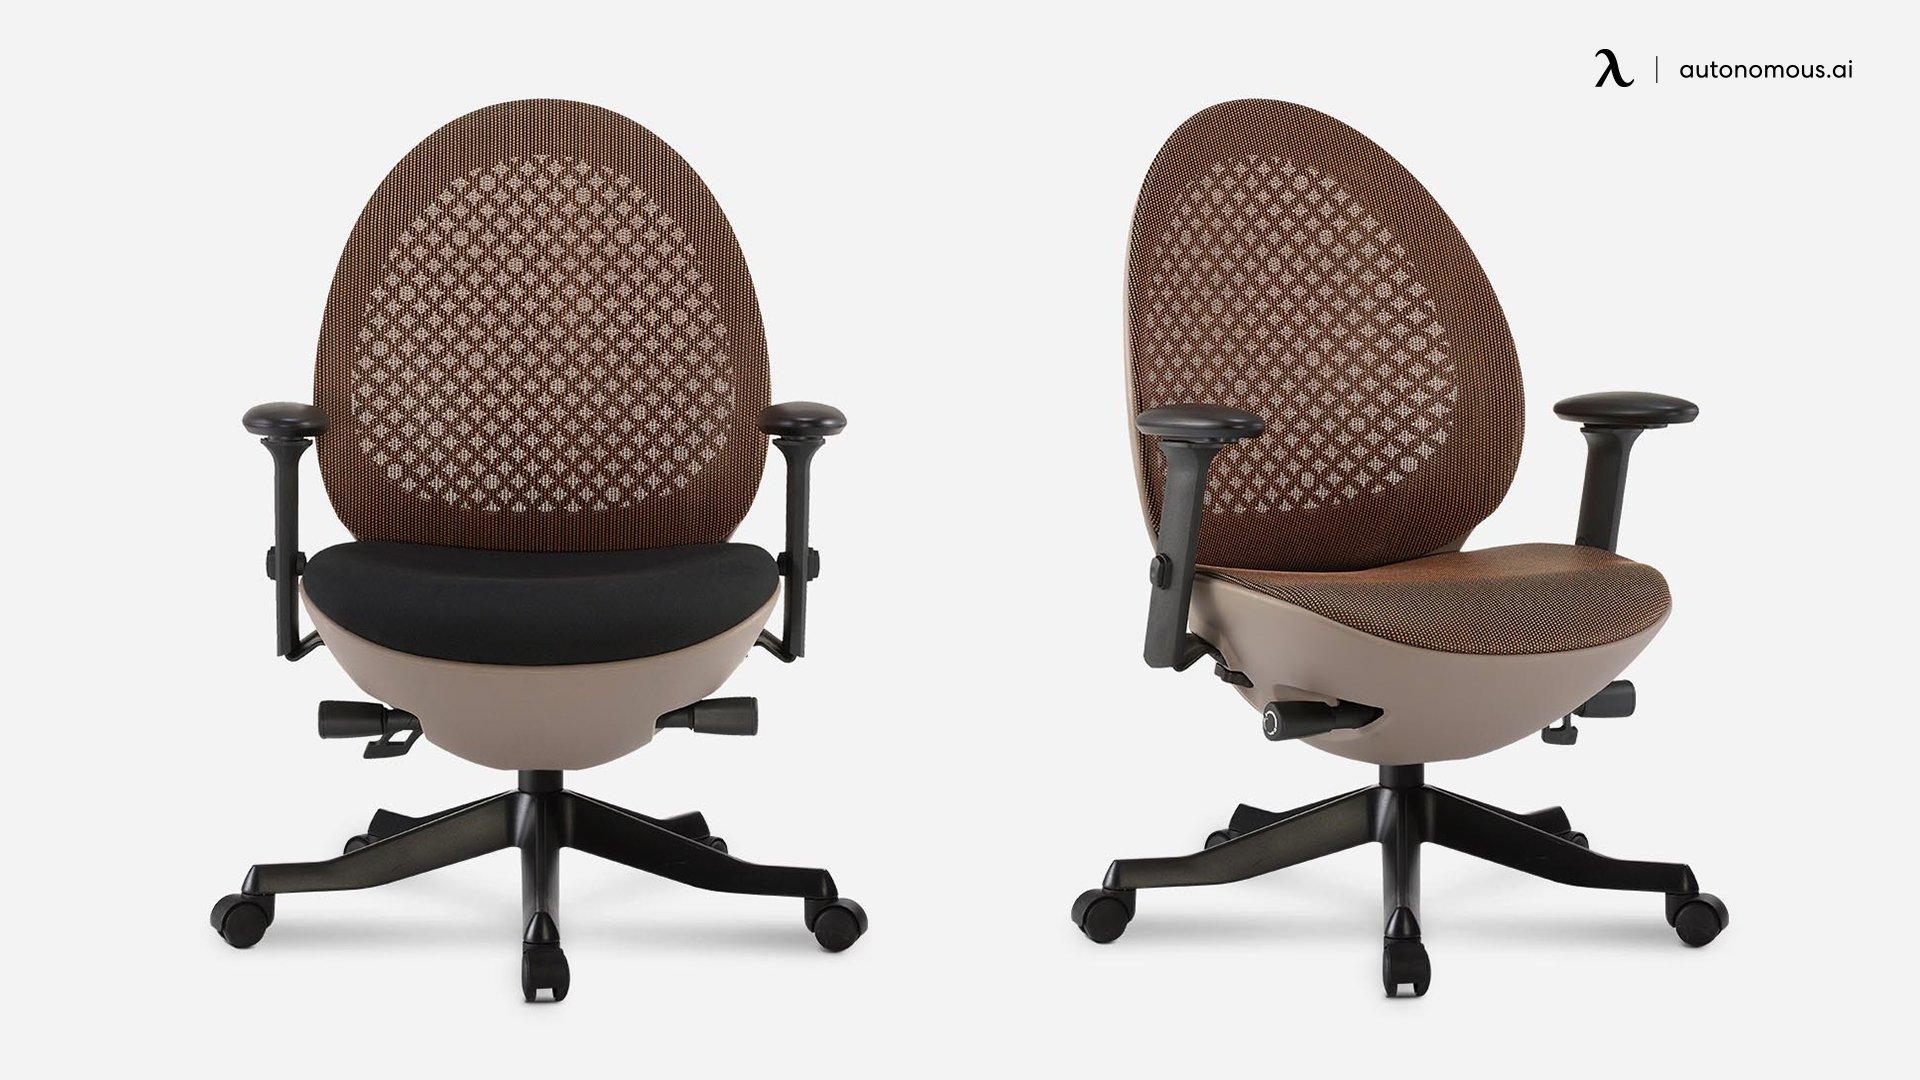 Avo Chair - Ergonomic chair under $500